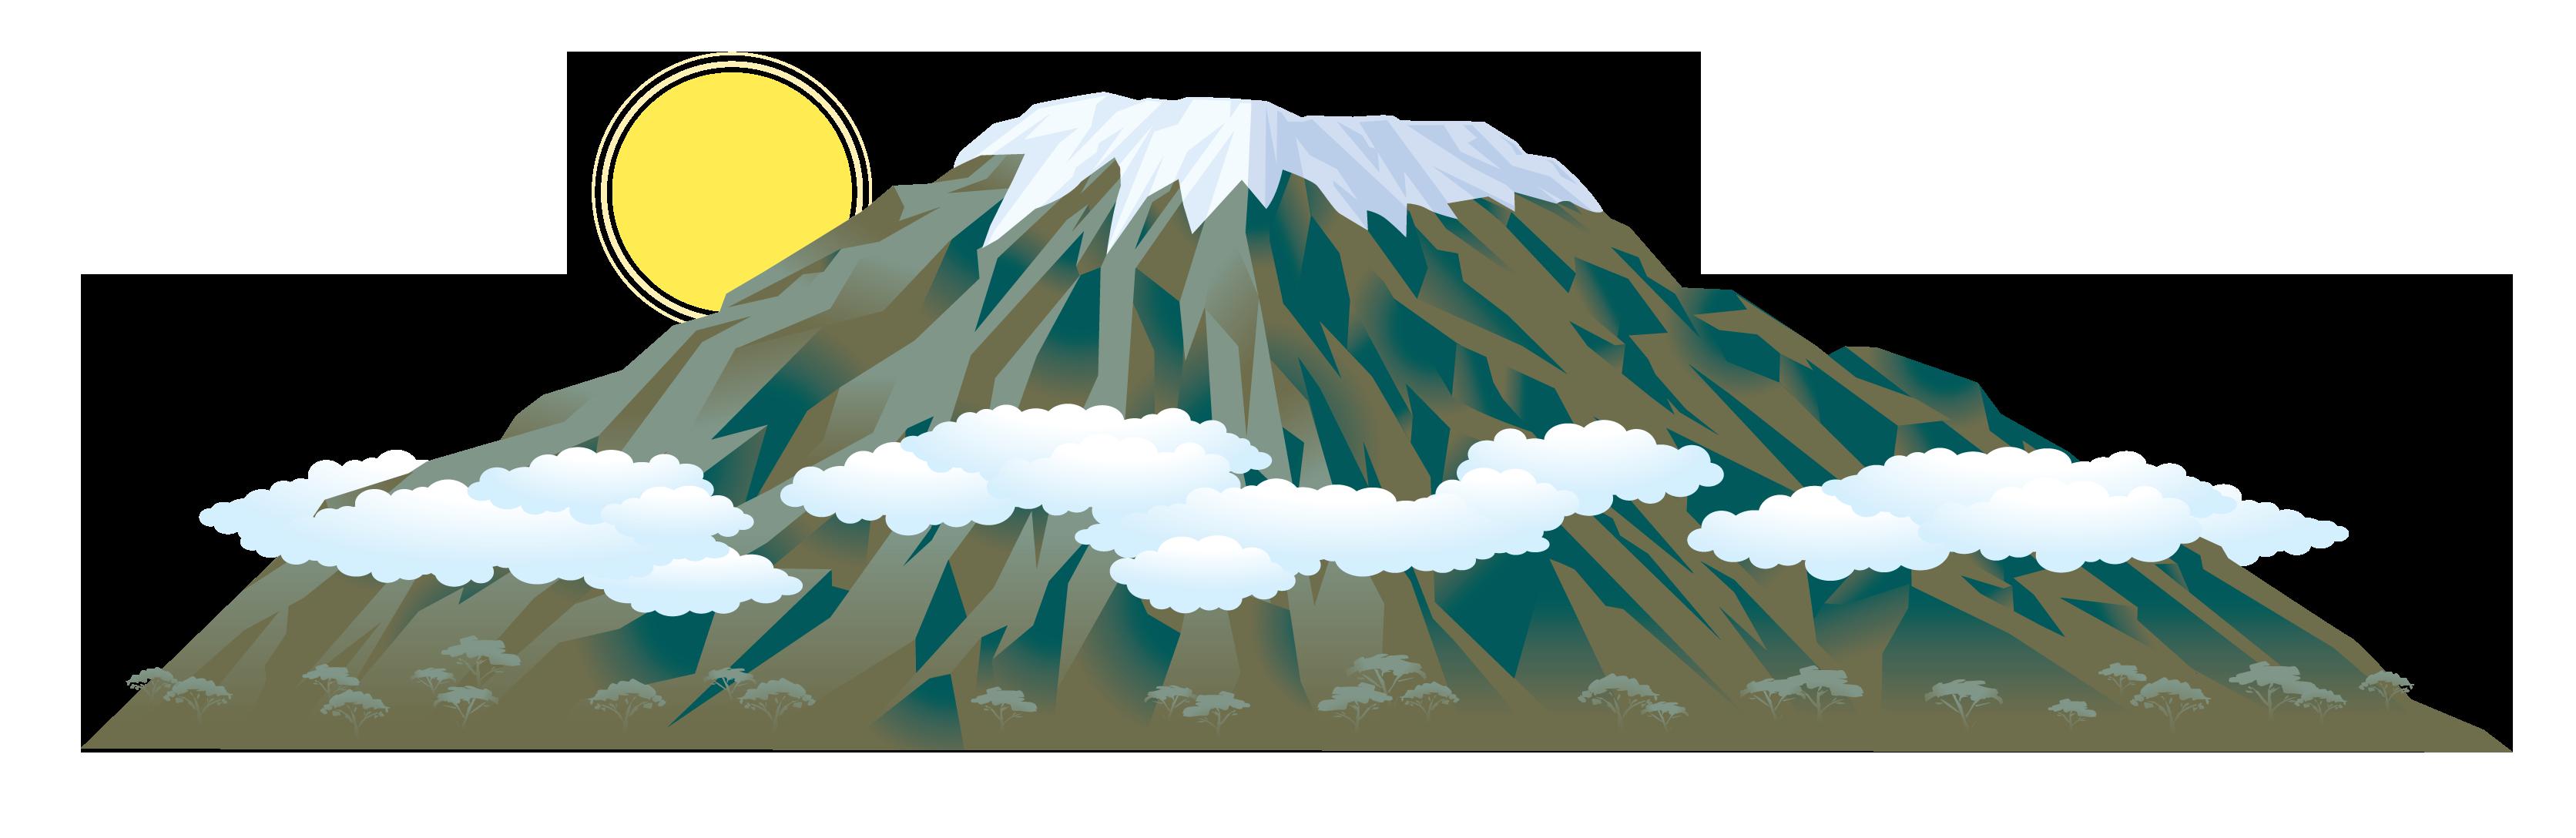 Mount kilimanjaro clip art. Mountain clipart everest